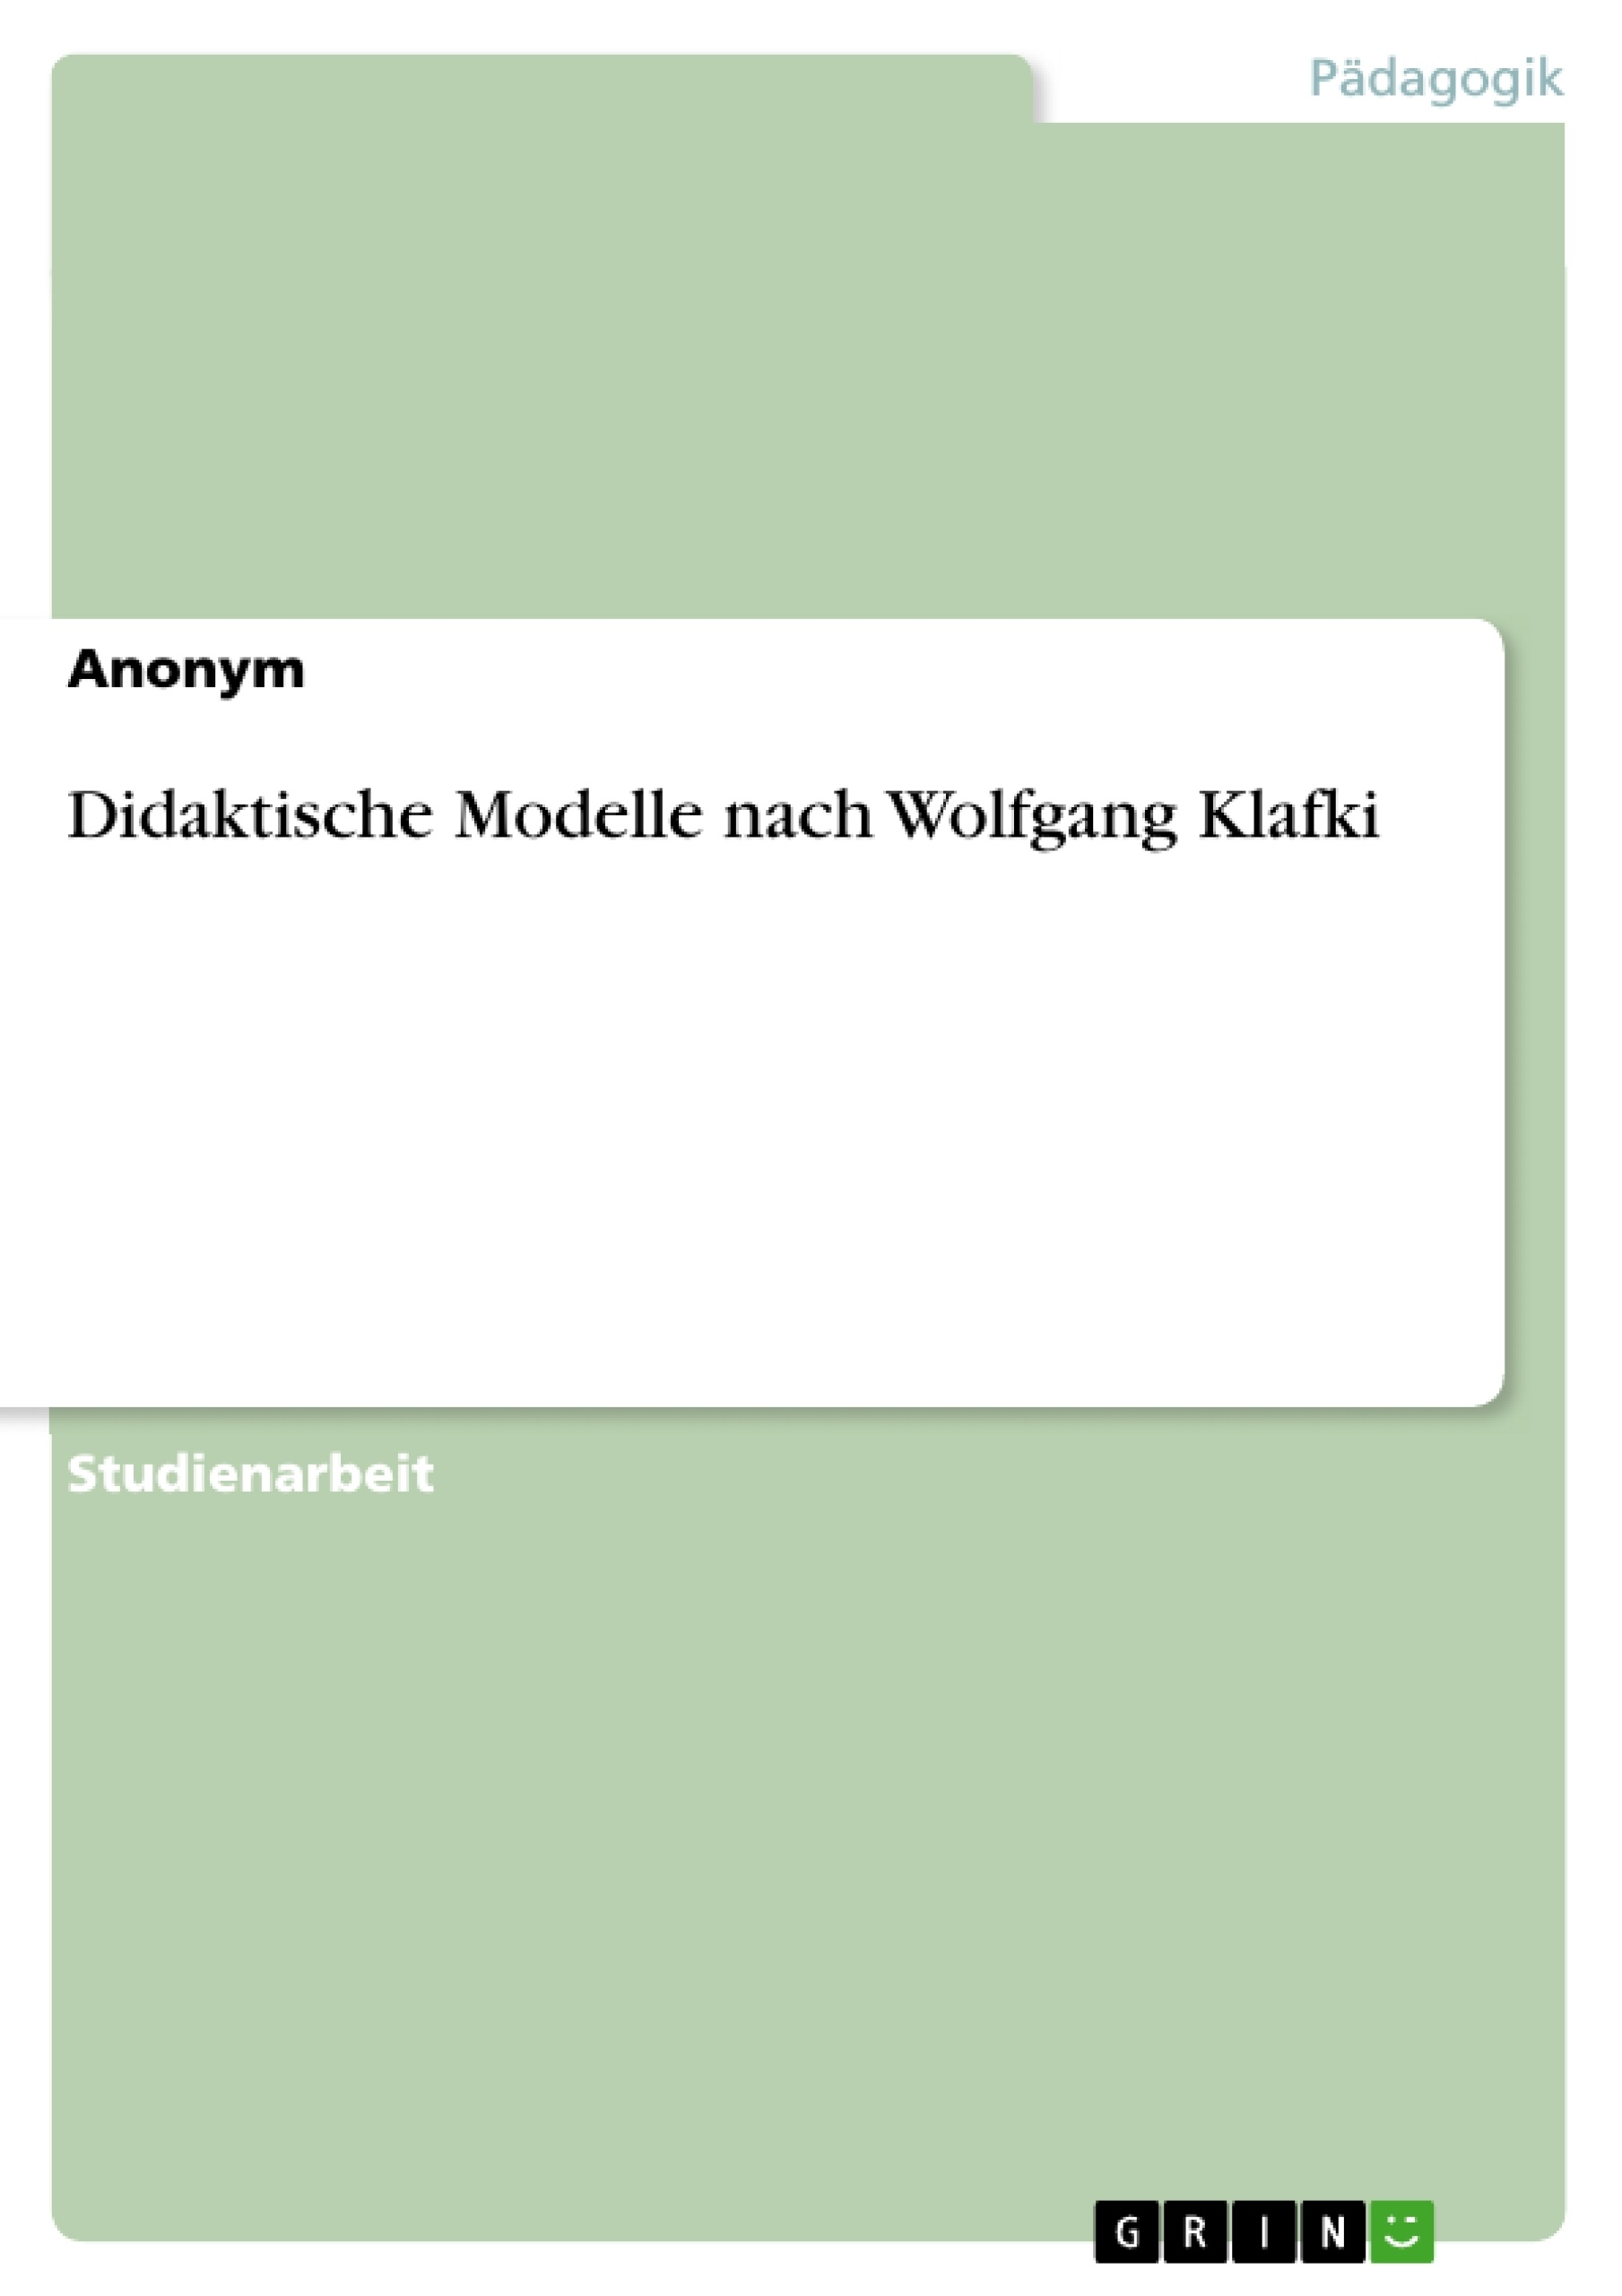 Titel: Didaktische Modelle nach Wolfgang Klafki